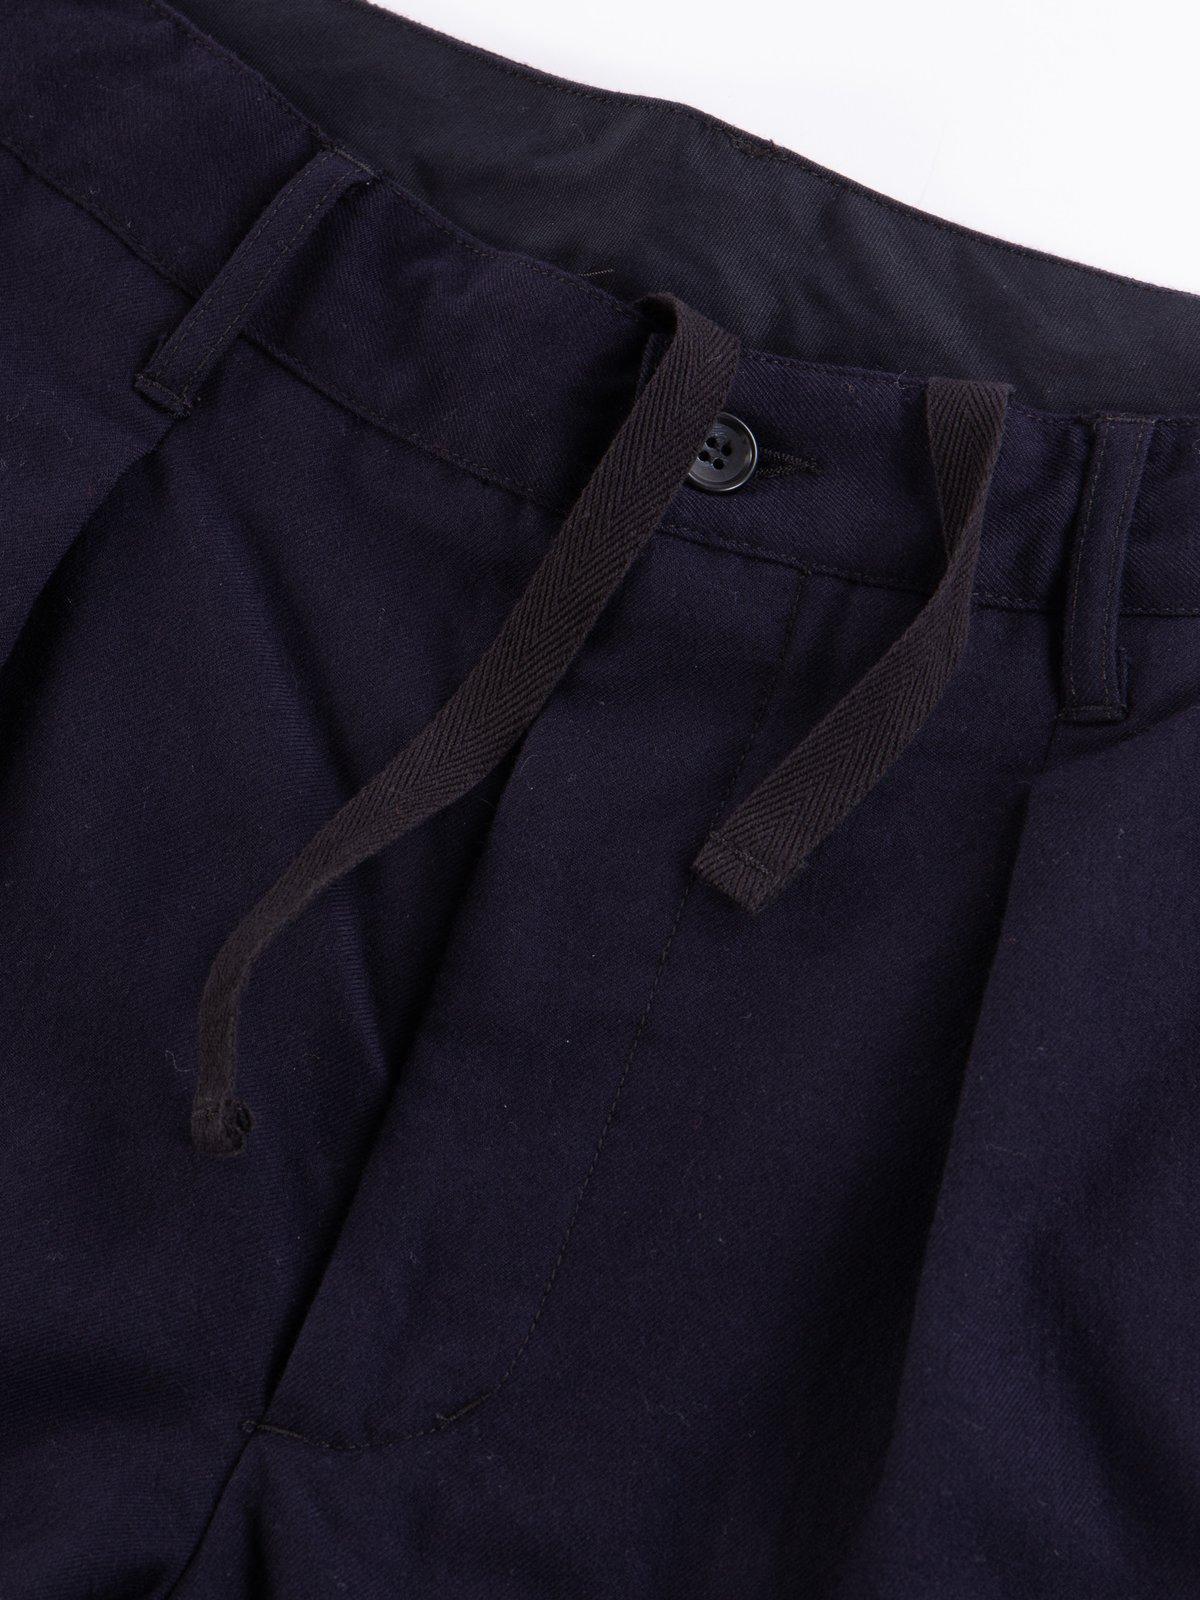 Dark Navy Wool Uniform Serge Carlyle Pant - Image 4